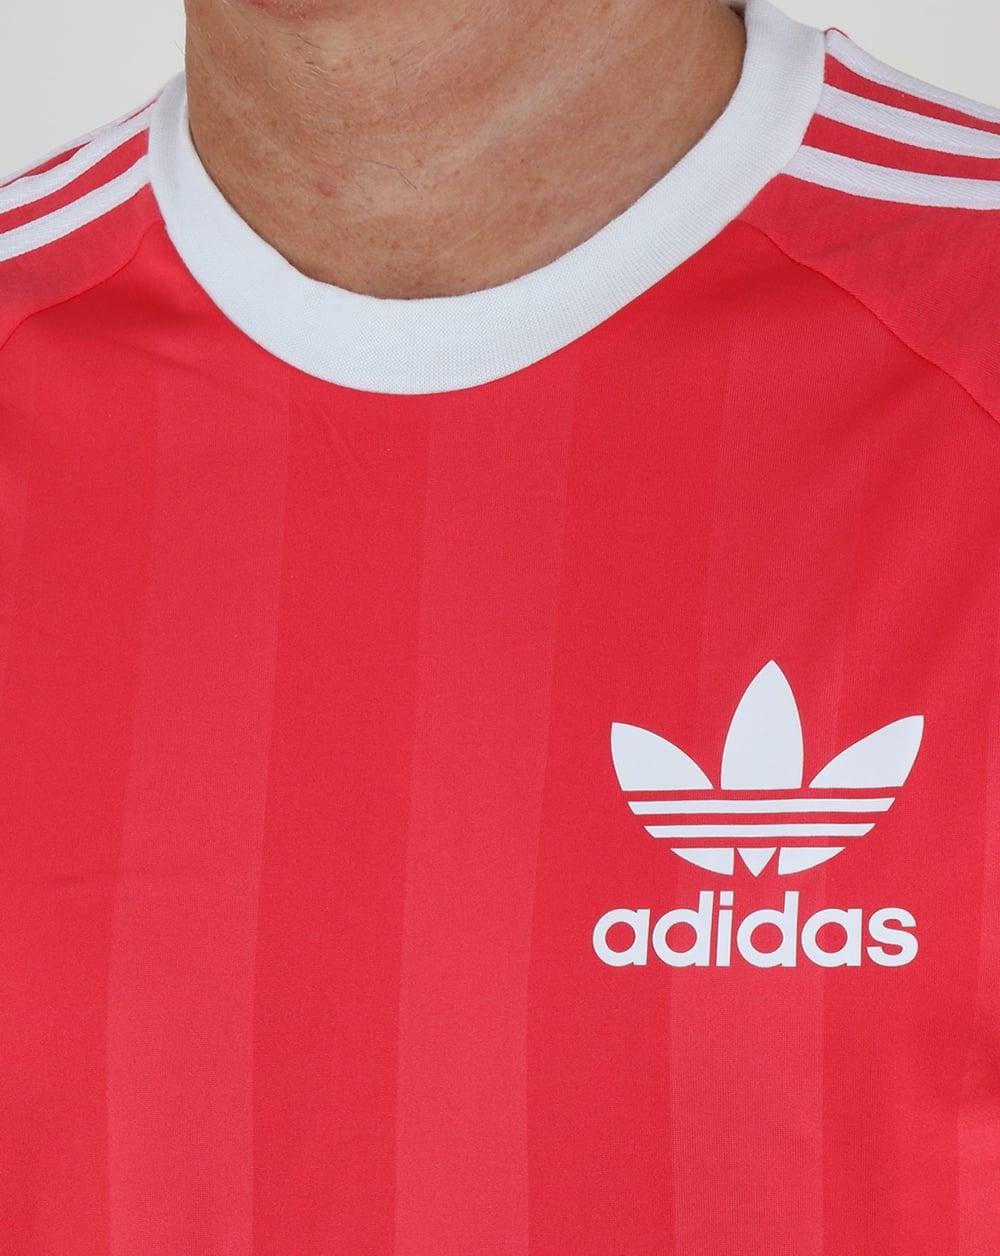 Adidas Originals California 3 Stripe T Shirt Red | Toffee Art